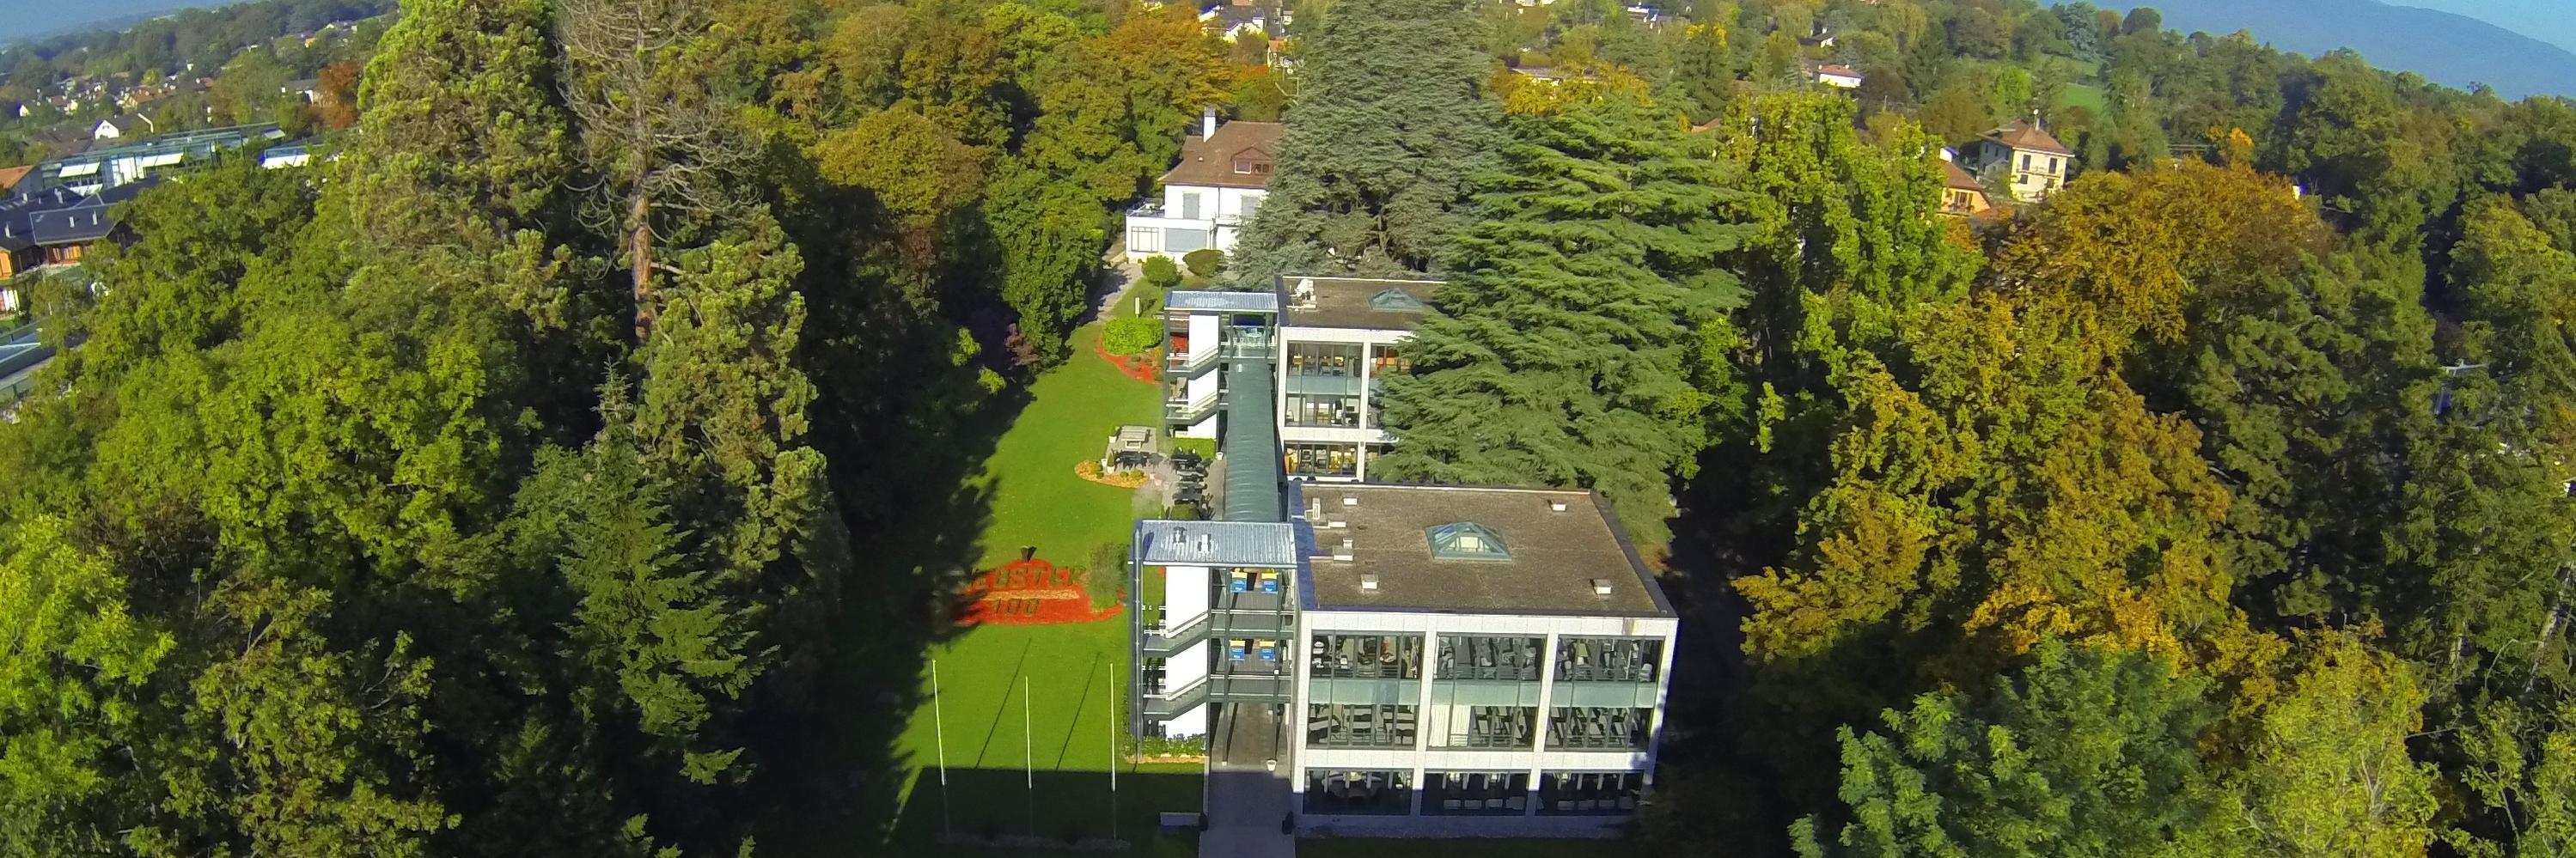 Webster University Geneva's official Twitter account